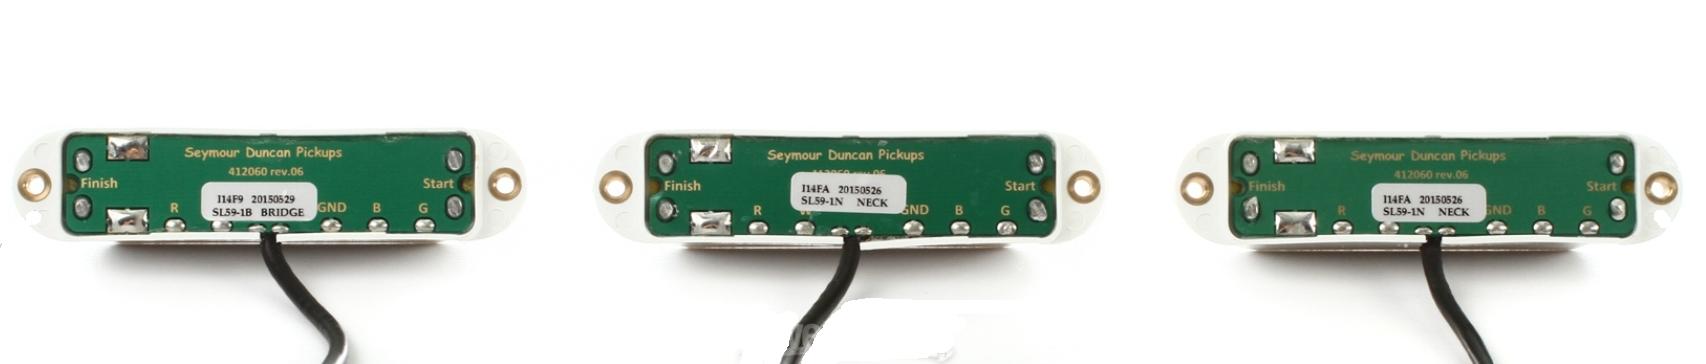 Seymour Duncan 11208-22-W Little 59 Strat Pickup Set in White ...